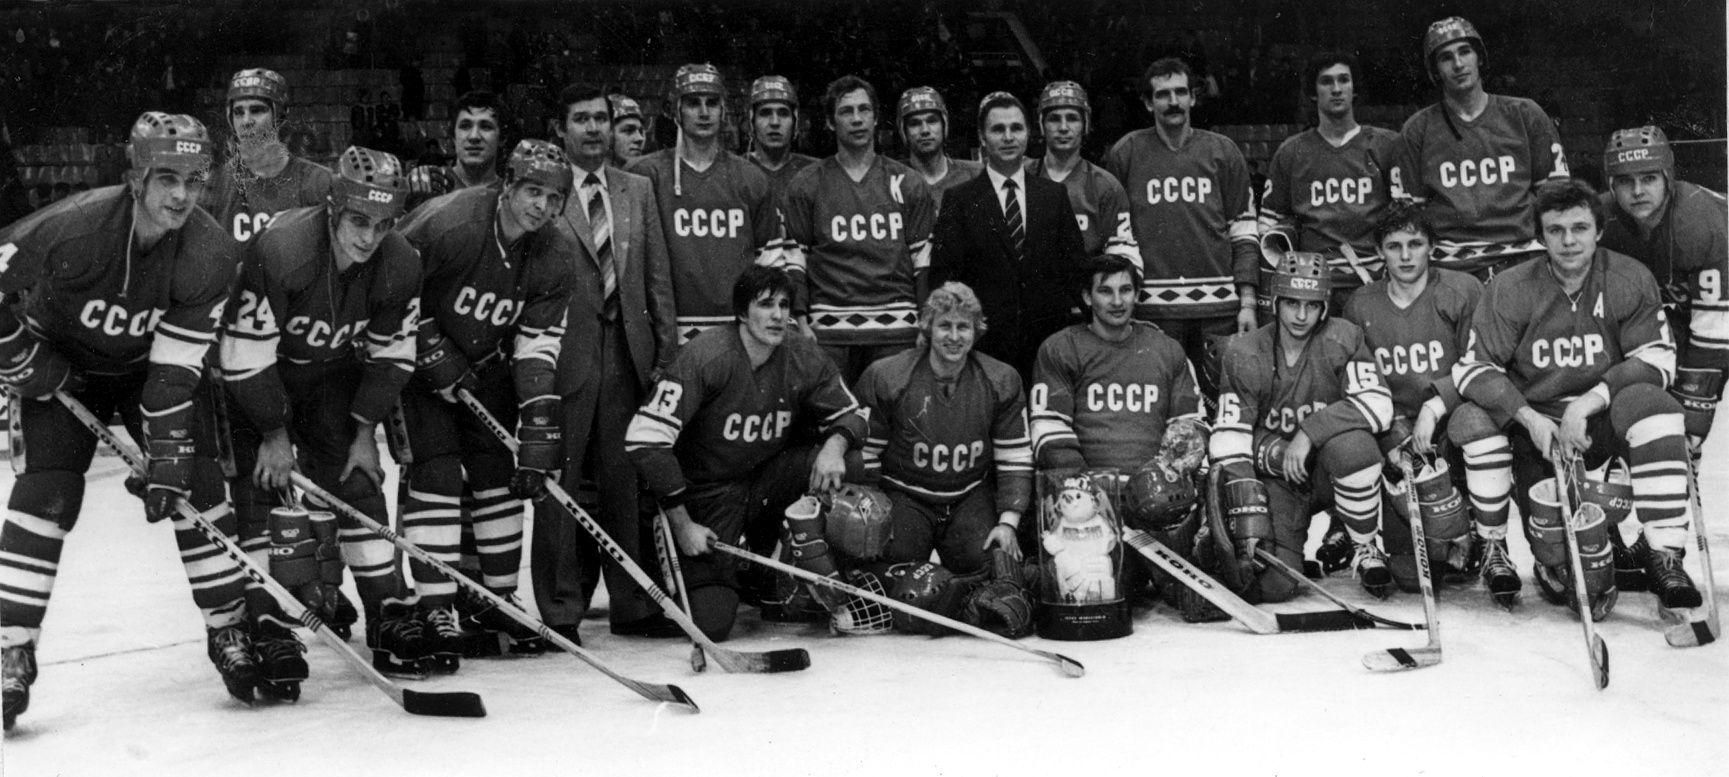 Прощайте, маршал Тихонов…. Хоккей. СПОРТ-ЭКСПРЕСС: https://www.sport-express.ru/hockey/reviews/833449/